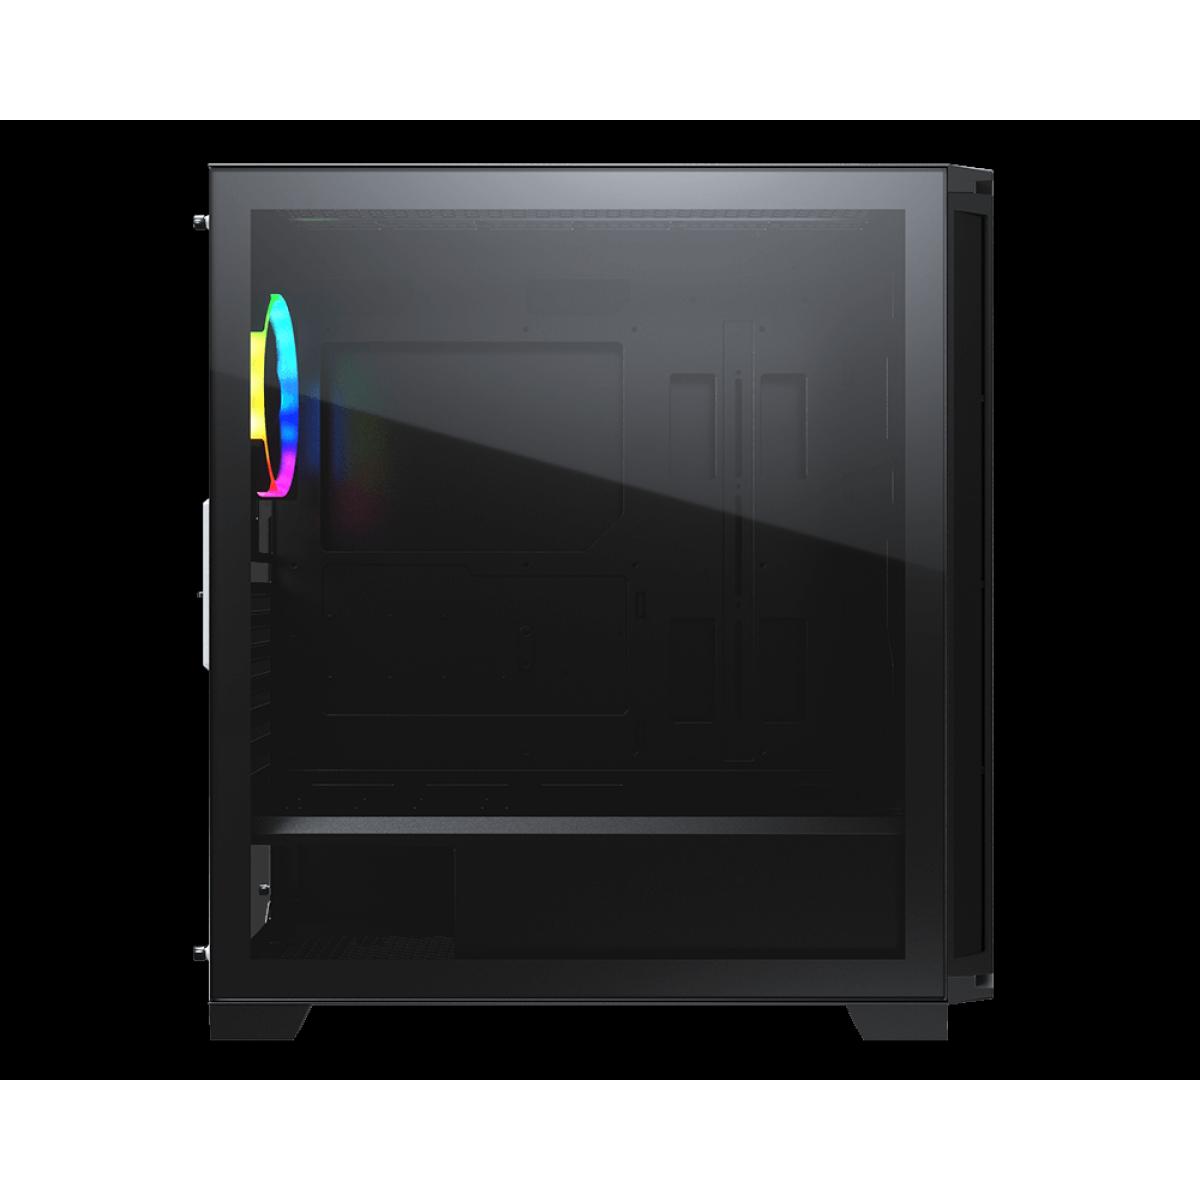 Gabinete Gamer Cougar DarkBlader X7, Mid Tower, Vidro Temperado, RGB, Translucent Black, Com 1 Fan, Sem Fonte, 385UM30.0004